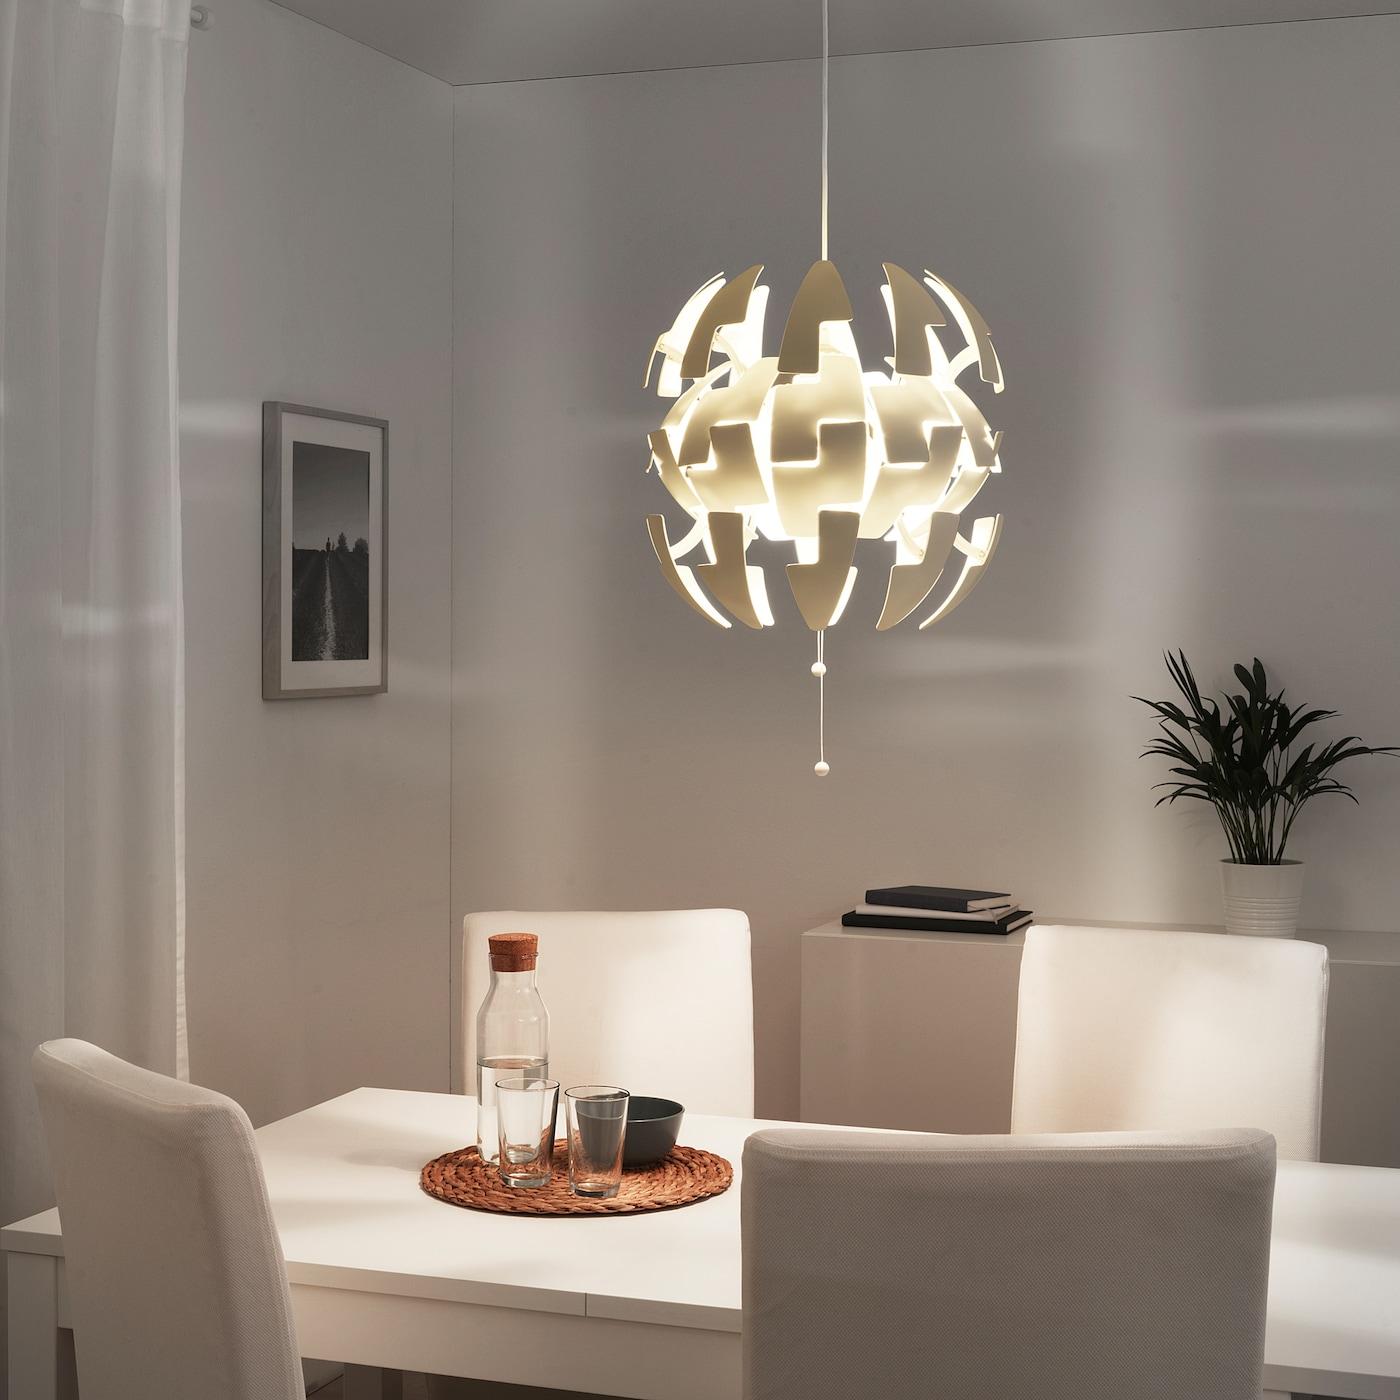 IKEA PS 2014 Pendant lamp, Modern